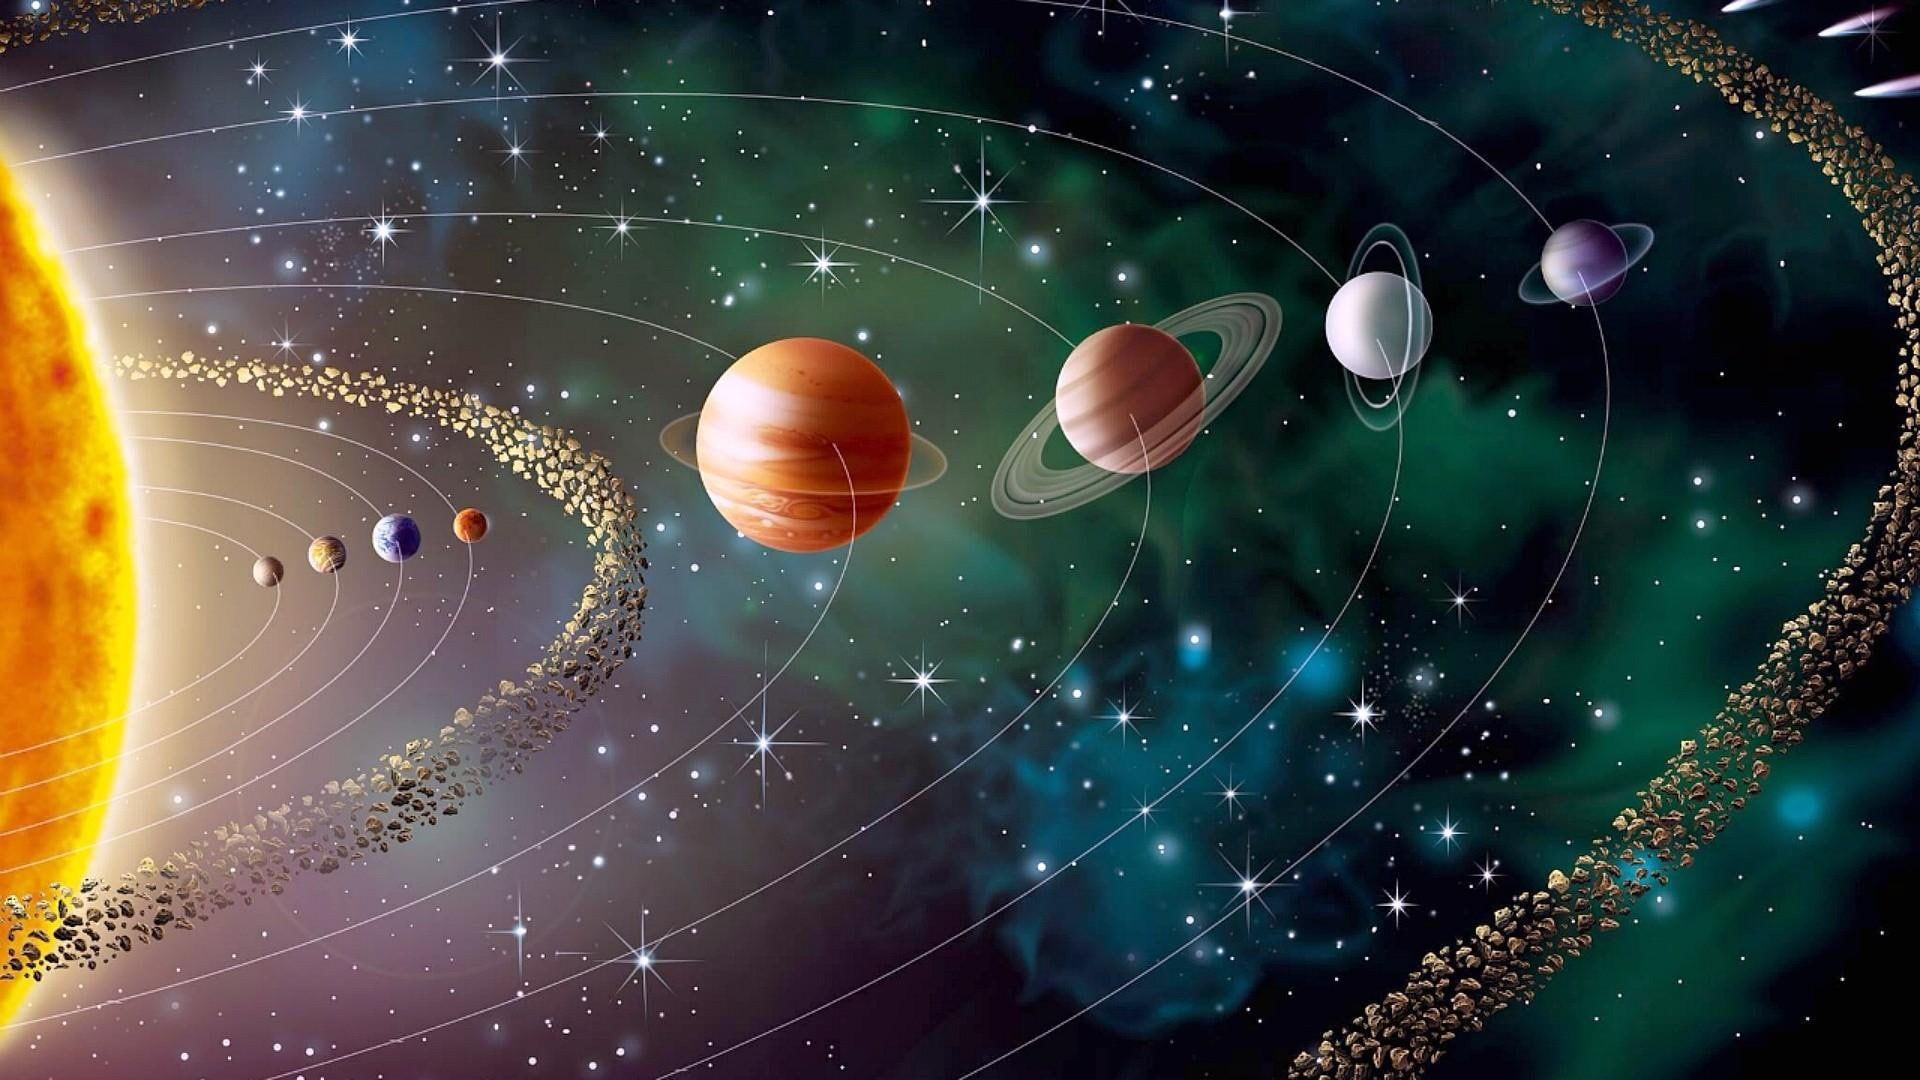 Solar System Digital Wallpaper Space Earth Sun Solar